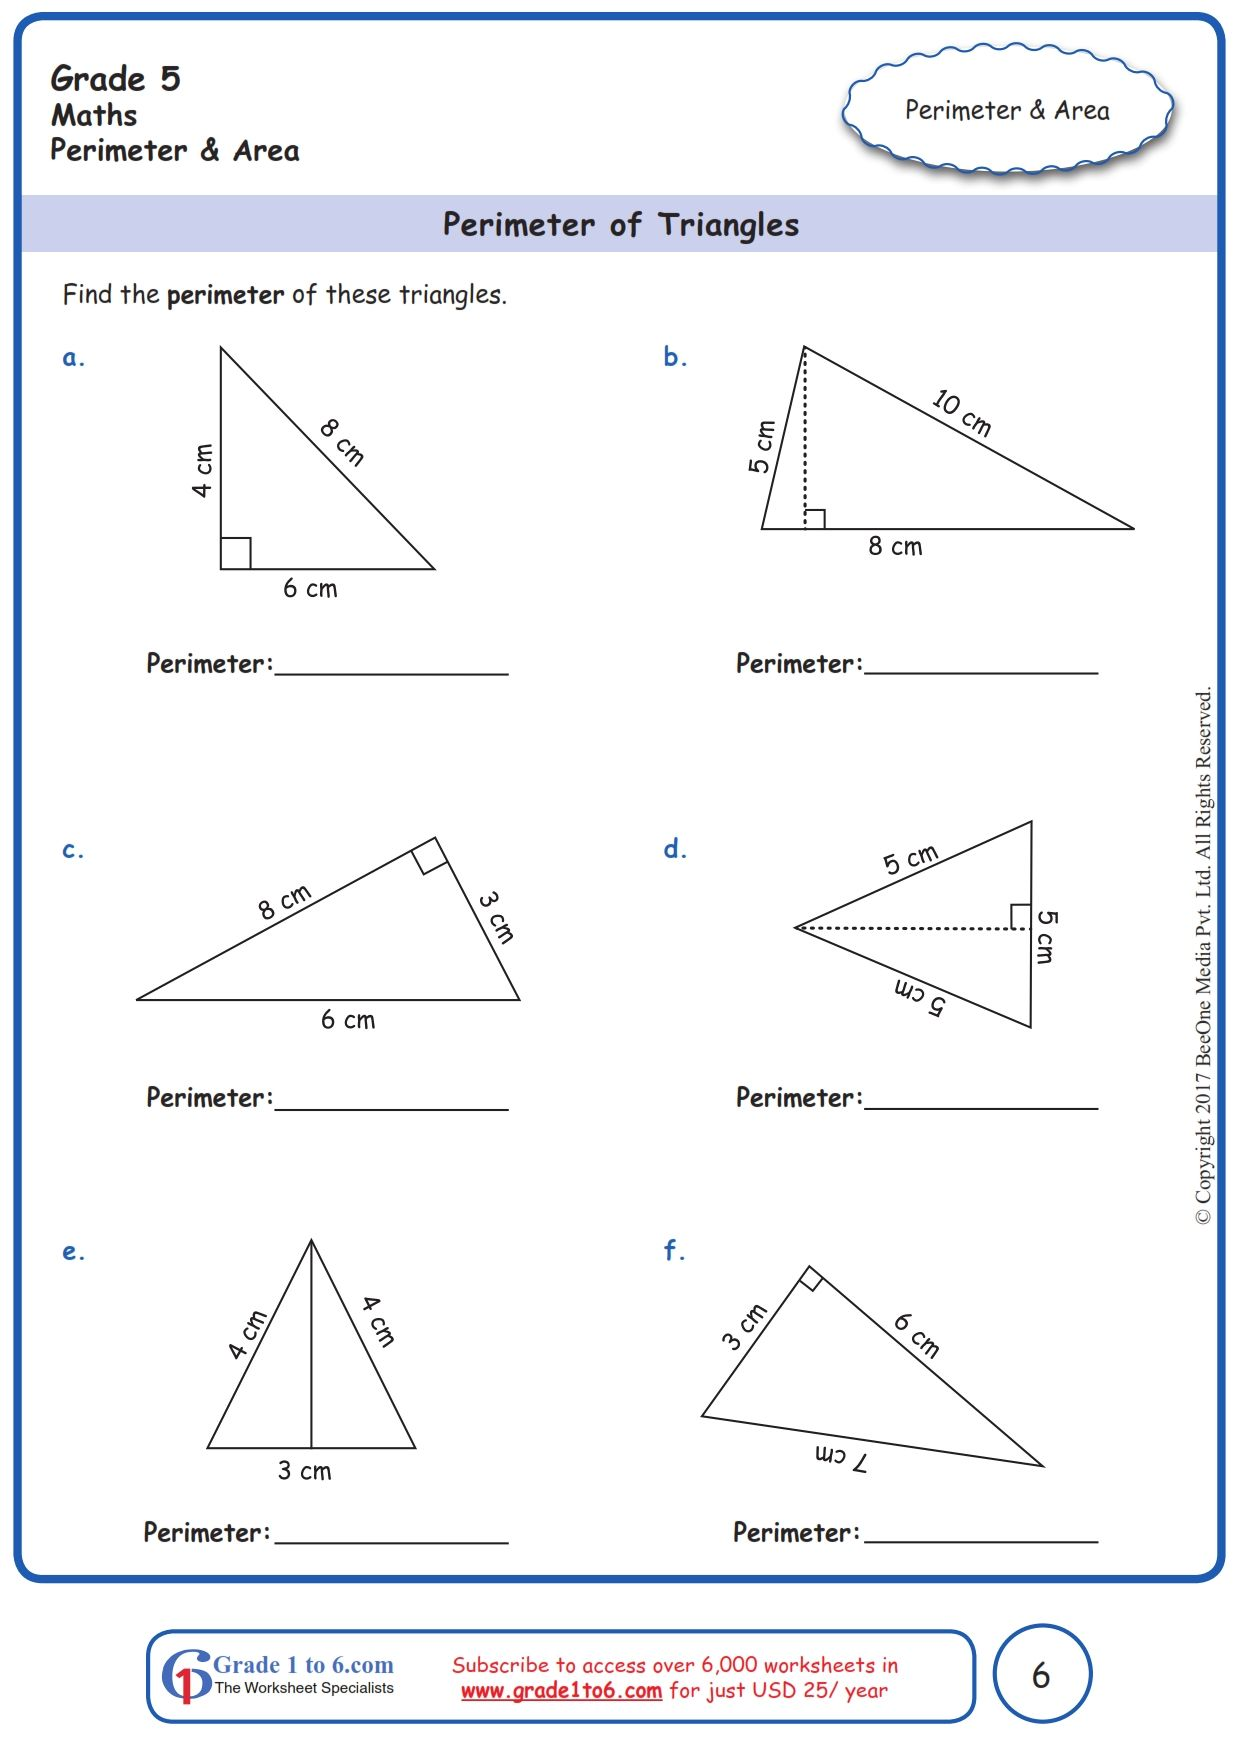 hight resolution of Worksheet Grade 5 Math Perimeter of Triangles   Perimeter worksheets